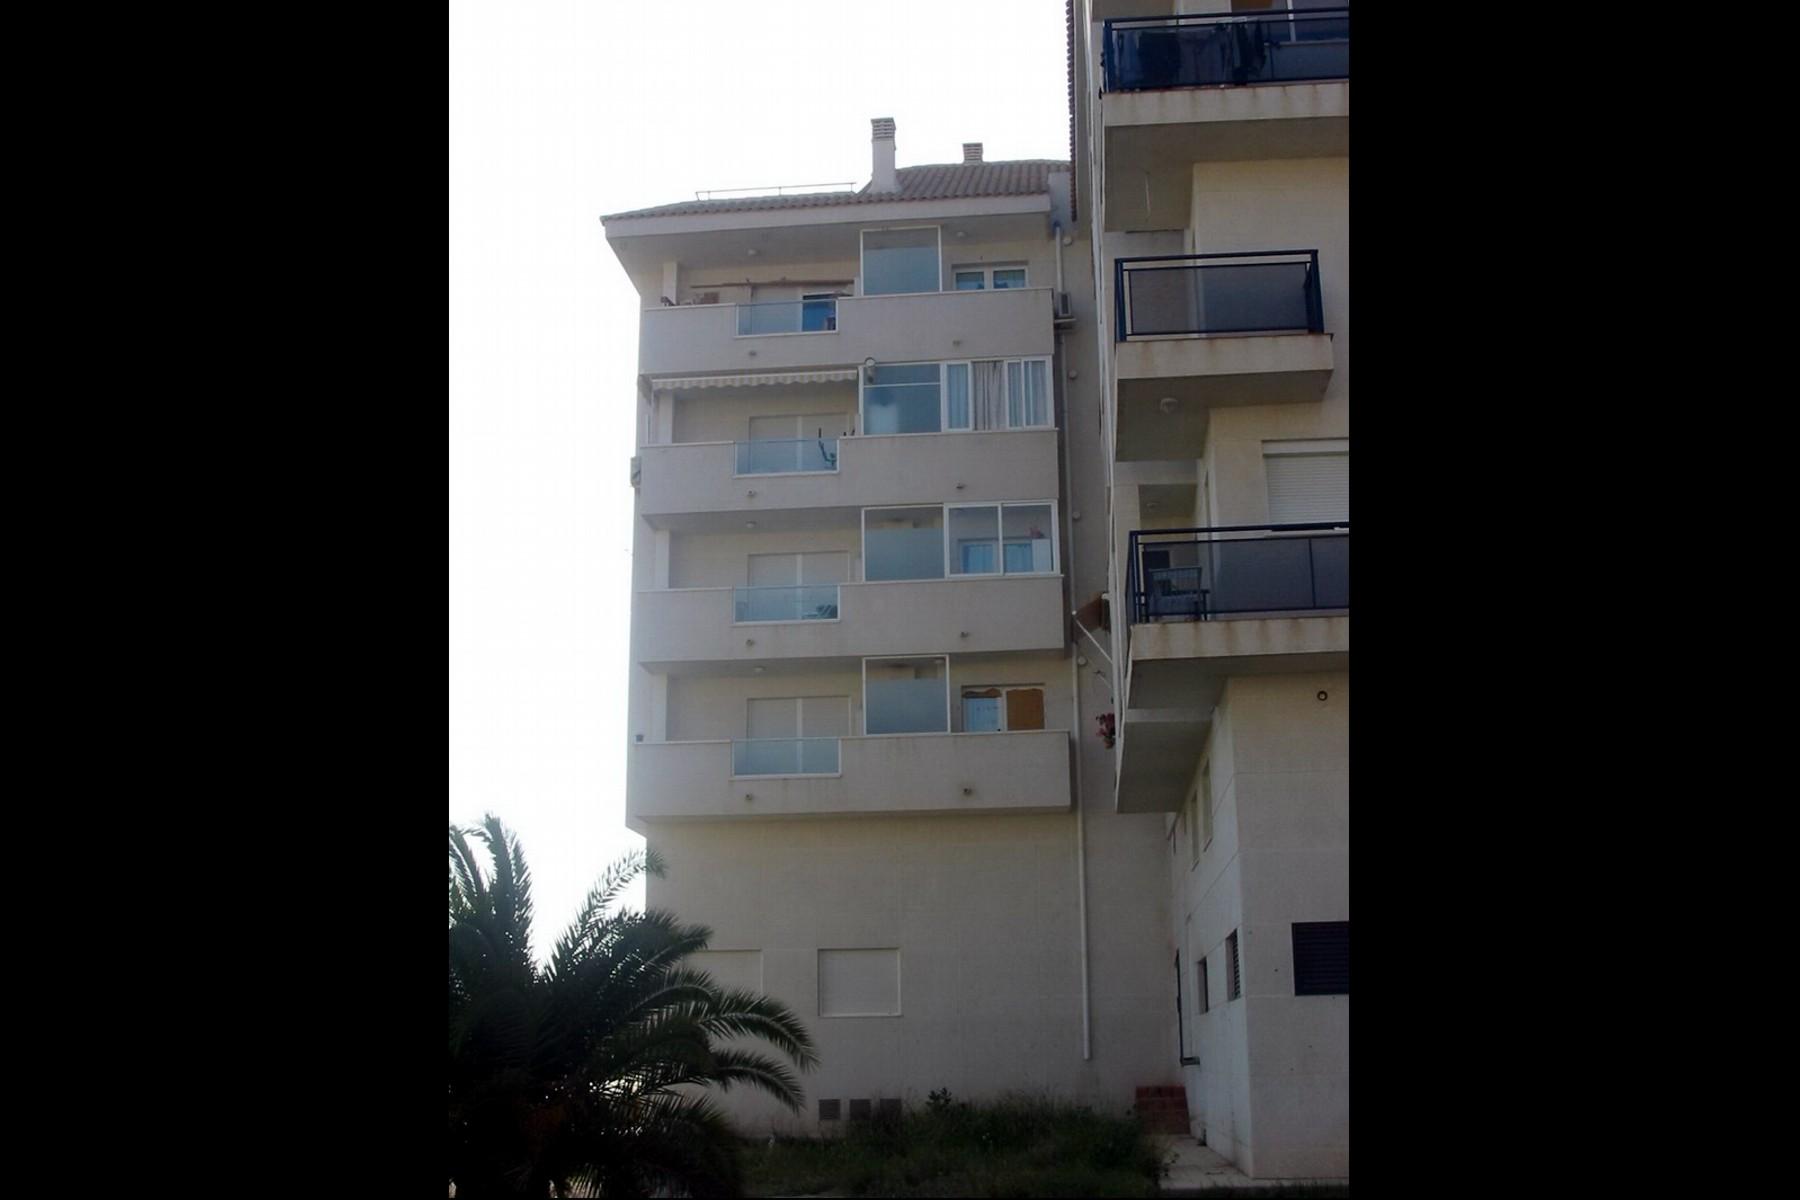 Imaginarq-053-Edificio-Viviendas-Altea-Alicante-19A